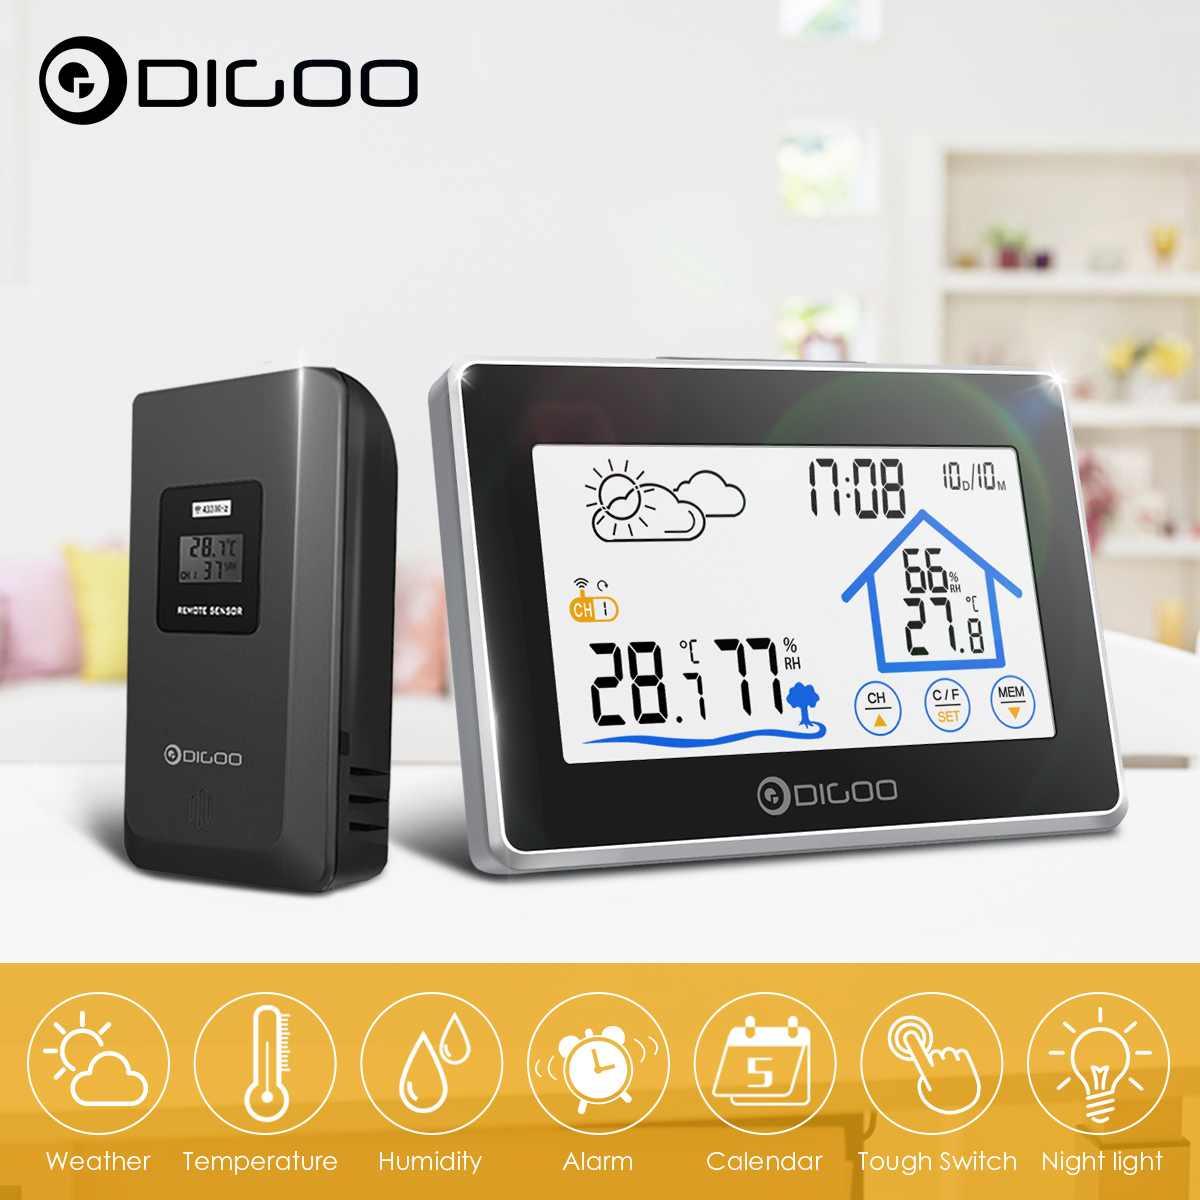 Digoo DG-TH8380 Farbe Bildschirm Wetter Station Sensor Thermometer Hygrometer Meter Digitale Prognose Sensor Indoor Outdoor Home